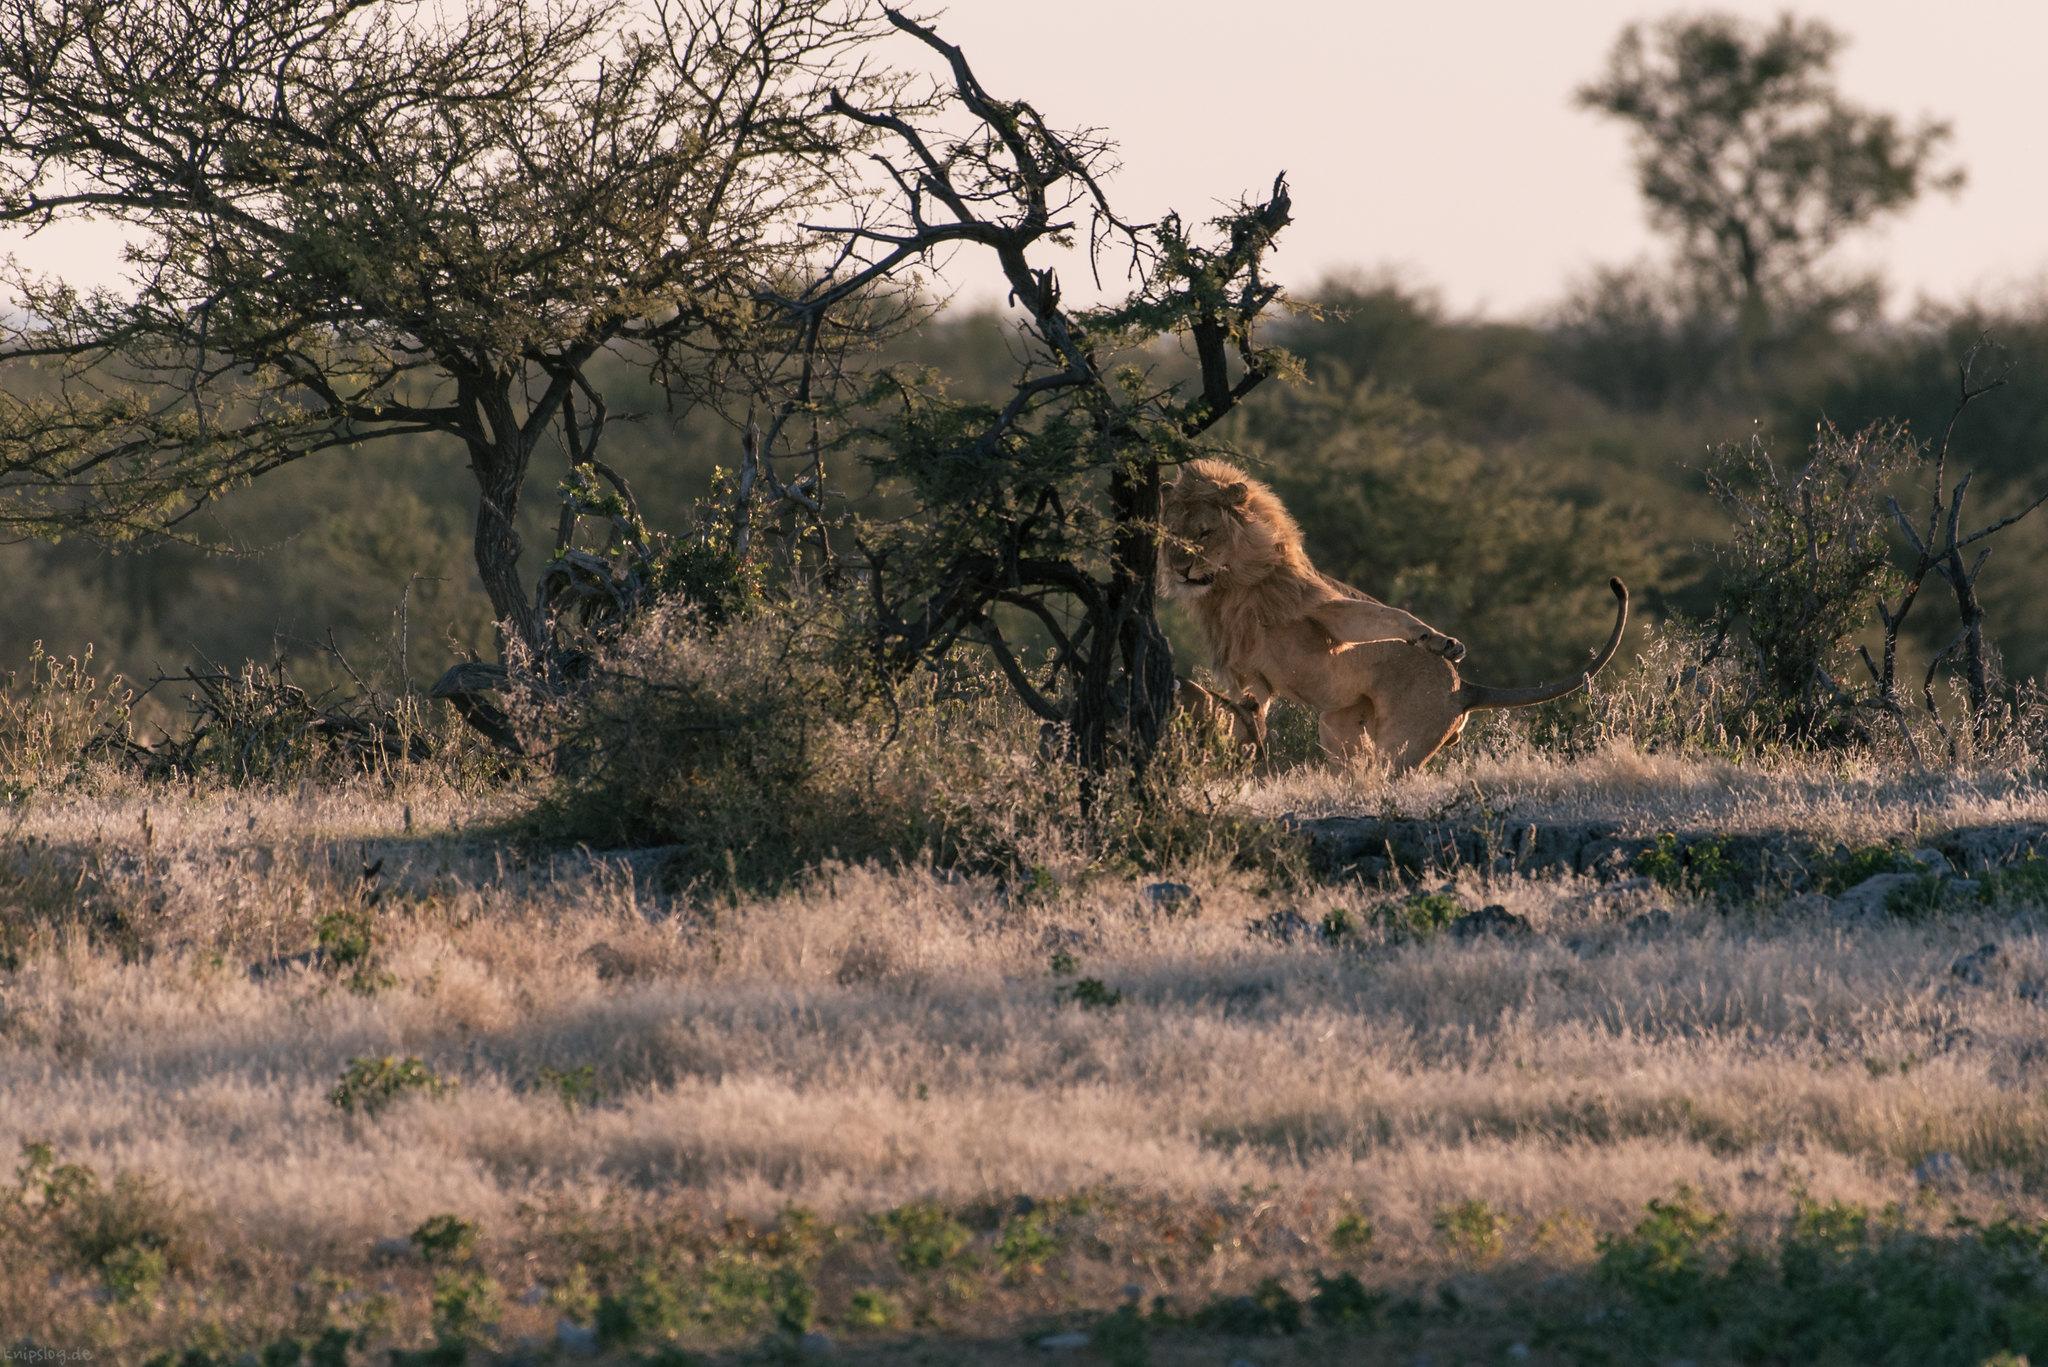 Lovemaking lions